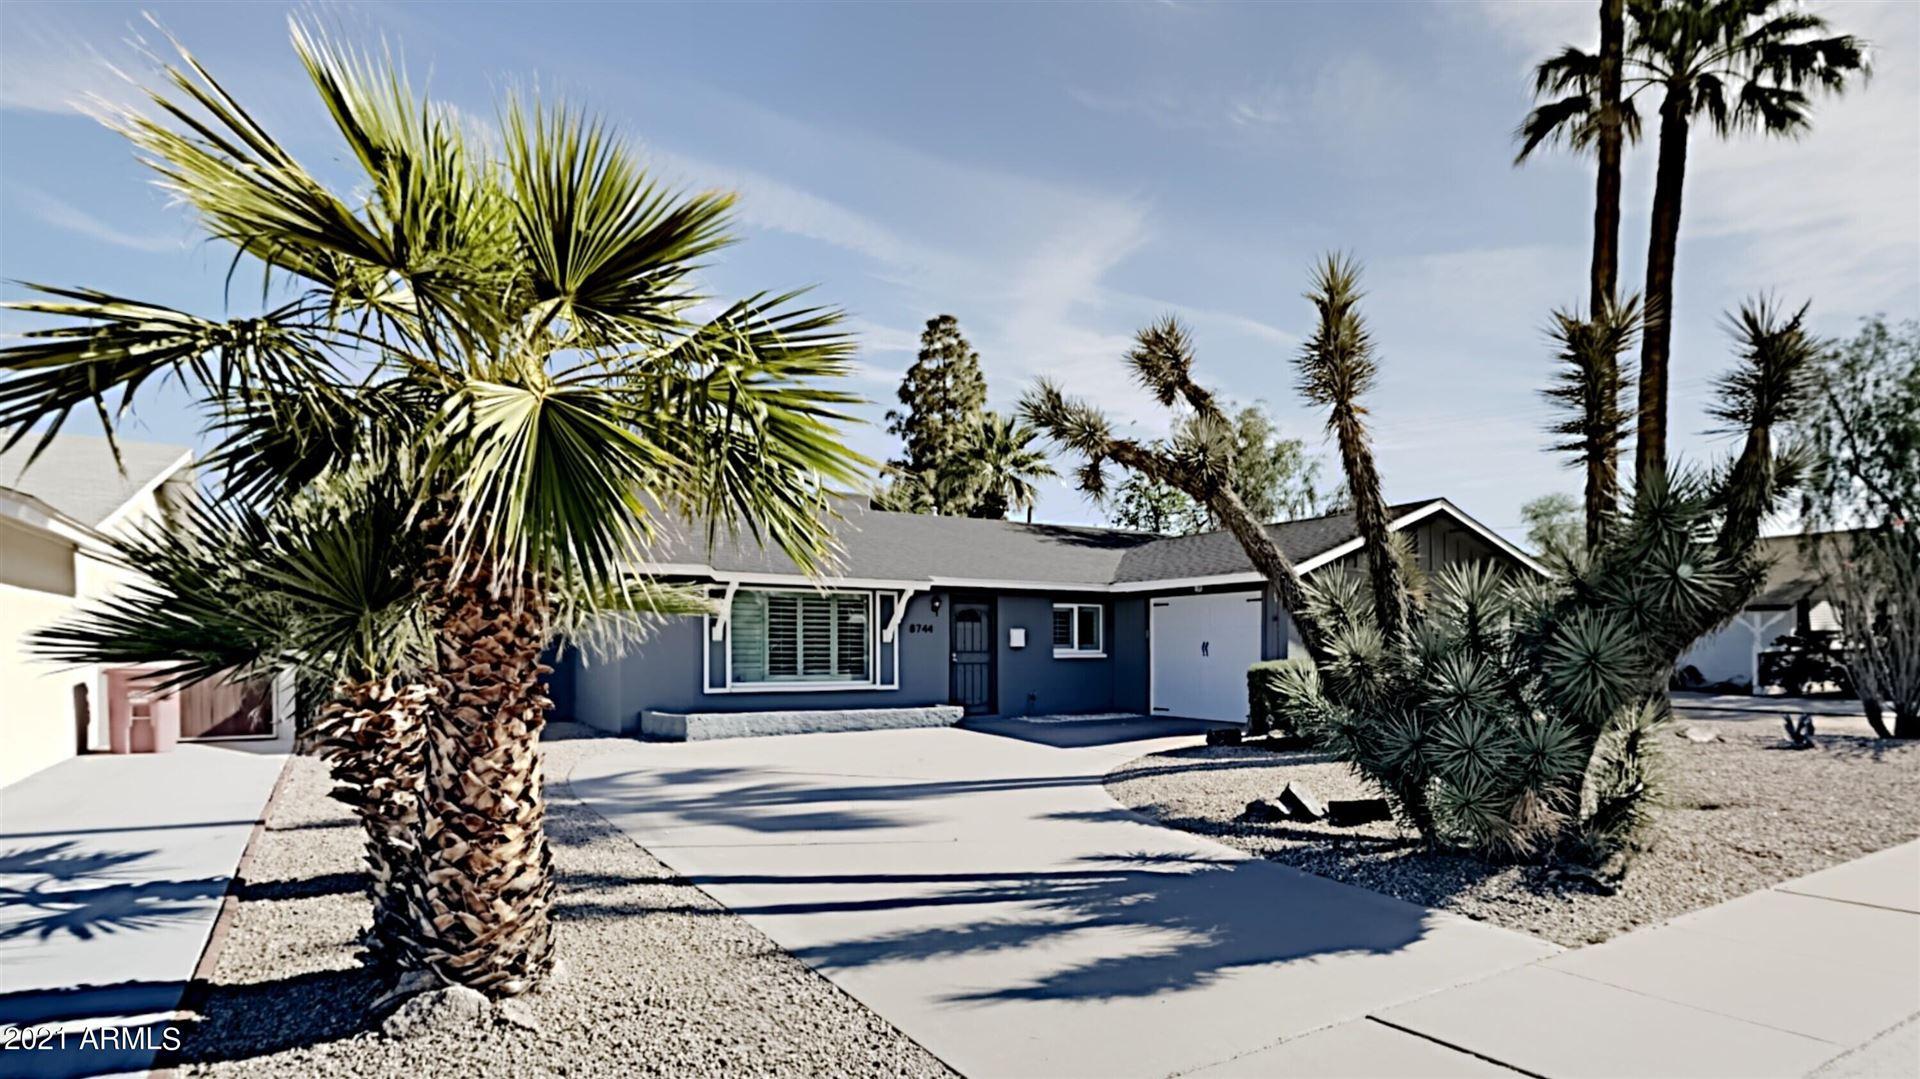 8744 E ROSE Lane, Scottsdale, AZ 85250 - #: 6223018